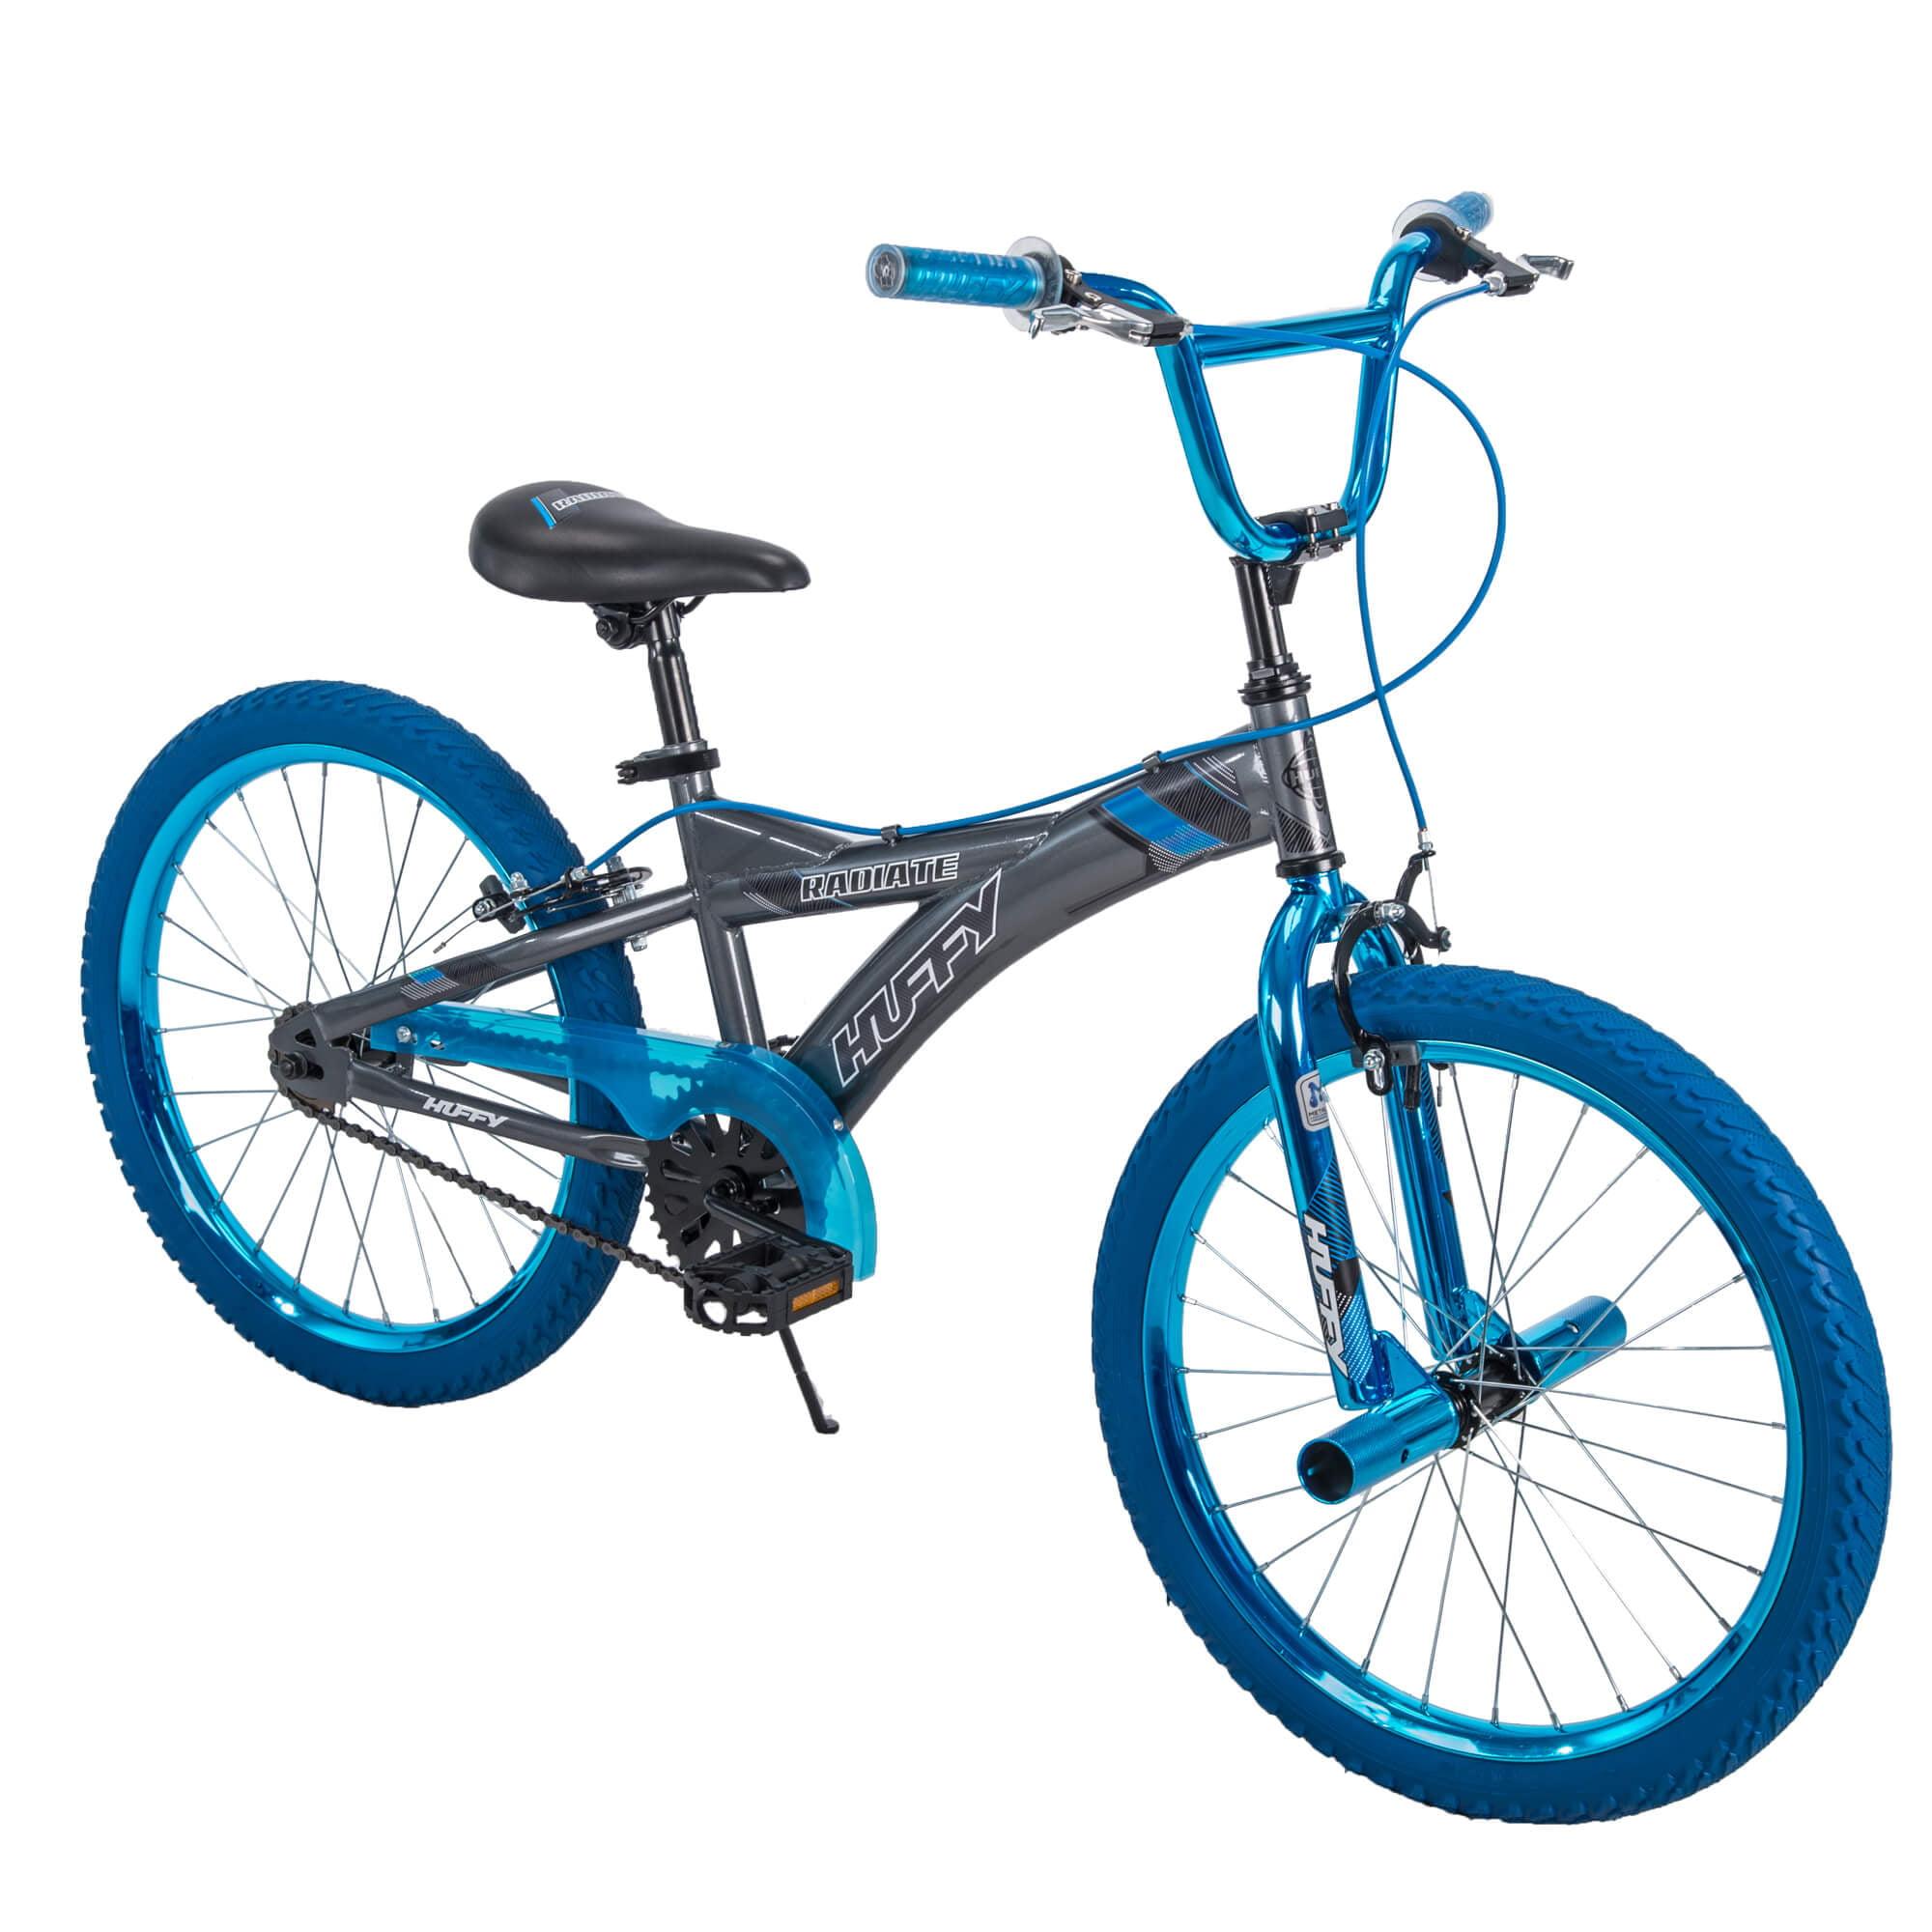 "Huffy 20"" Radium Boys' Metaloid BMX Bike, Silver with Blue Chrome by Huffy"